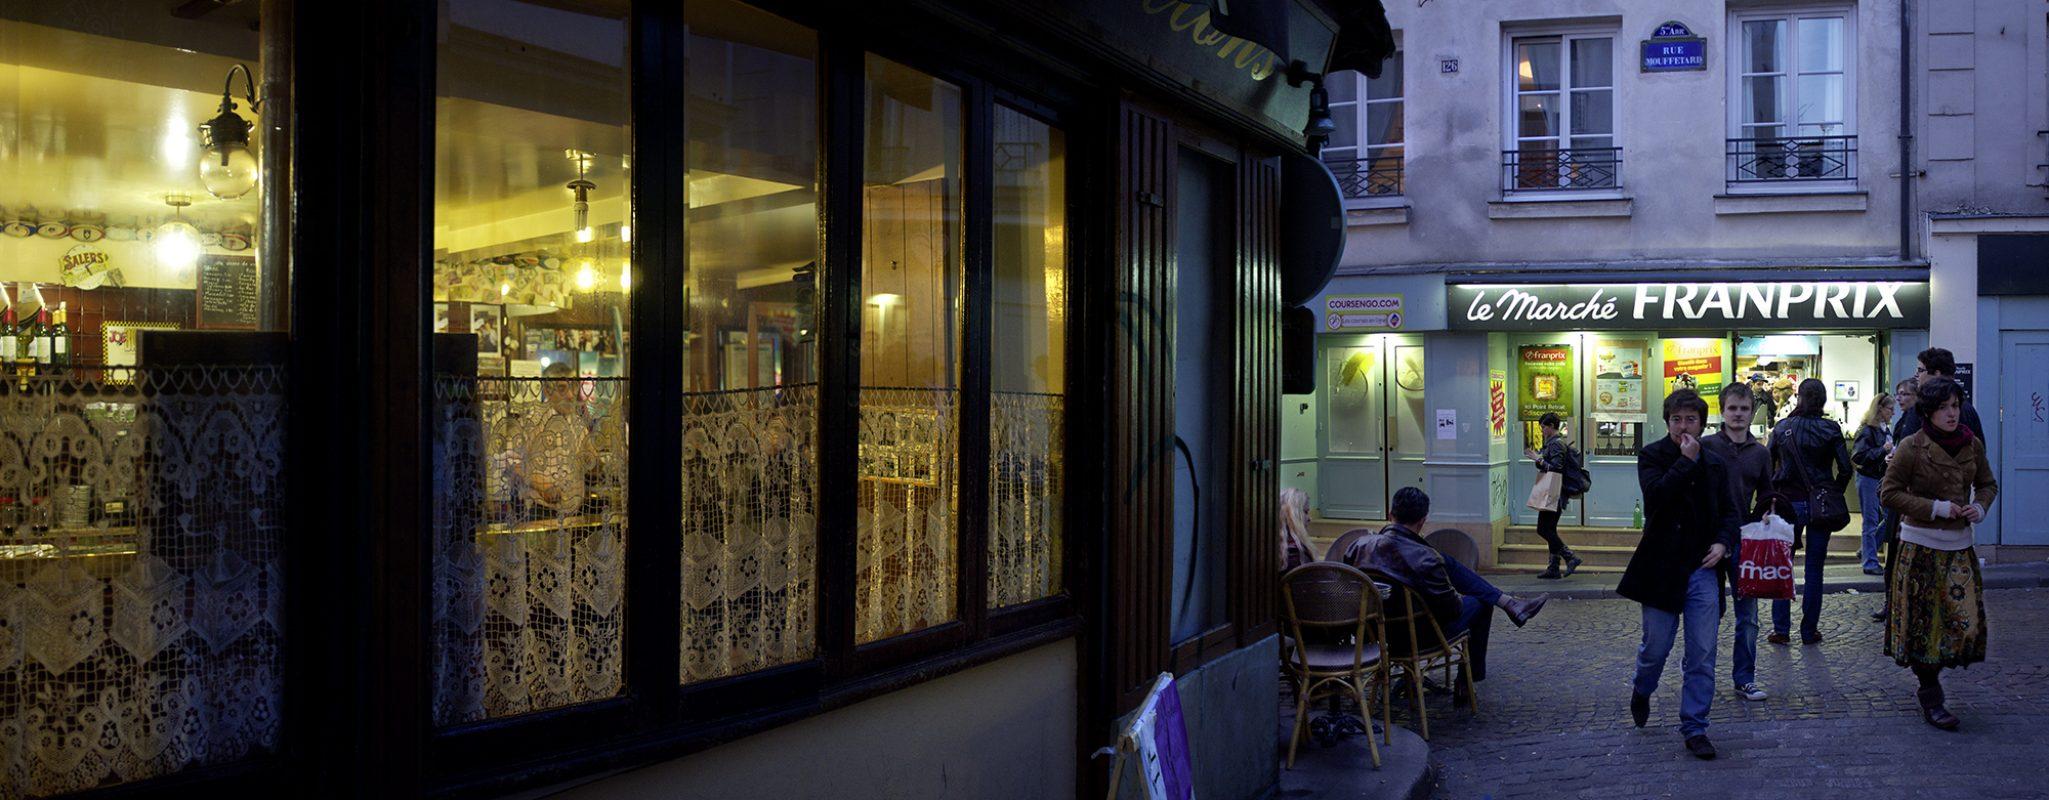 Rue Mouffetard, Abend